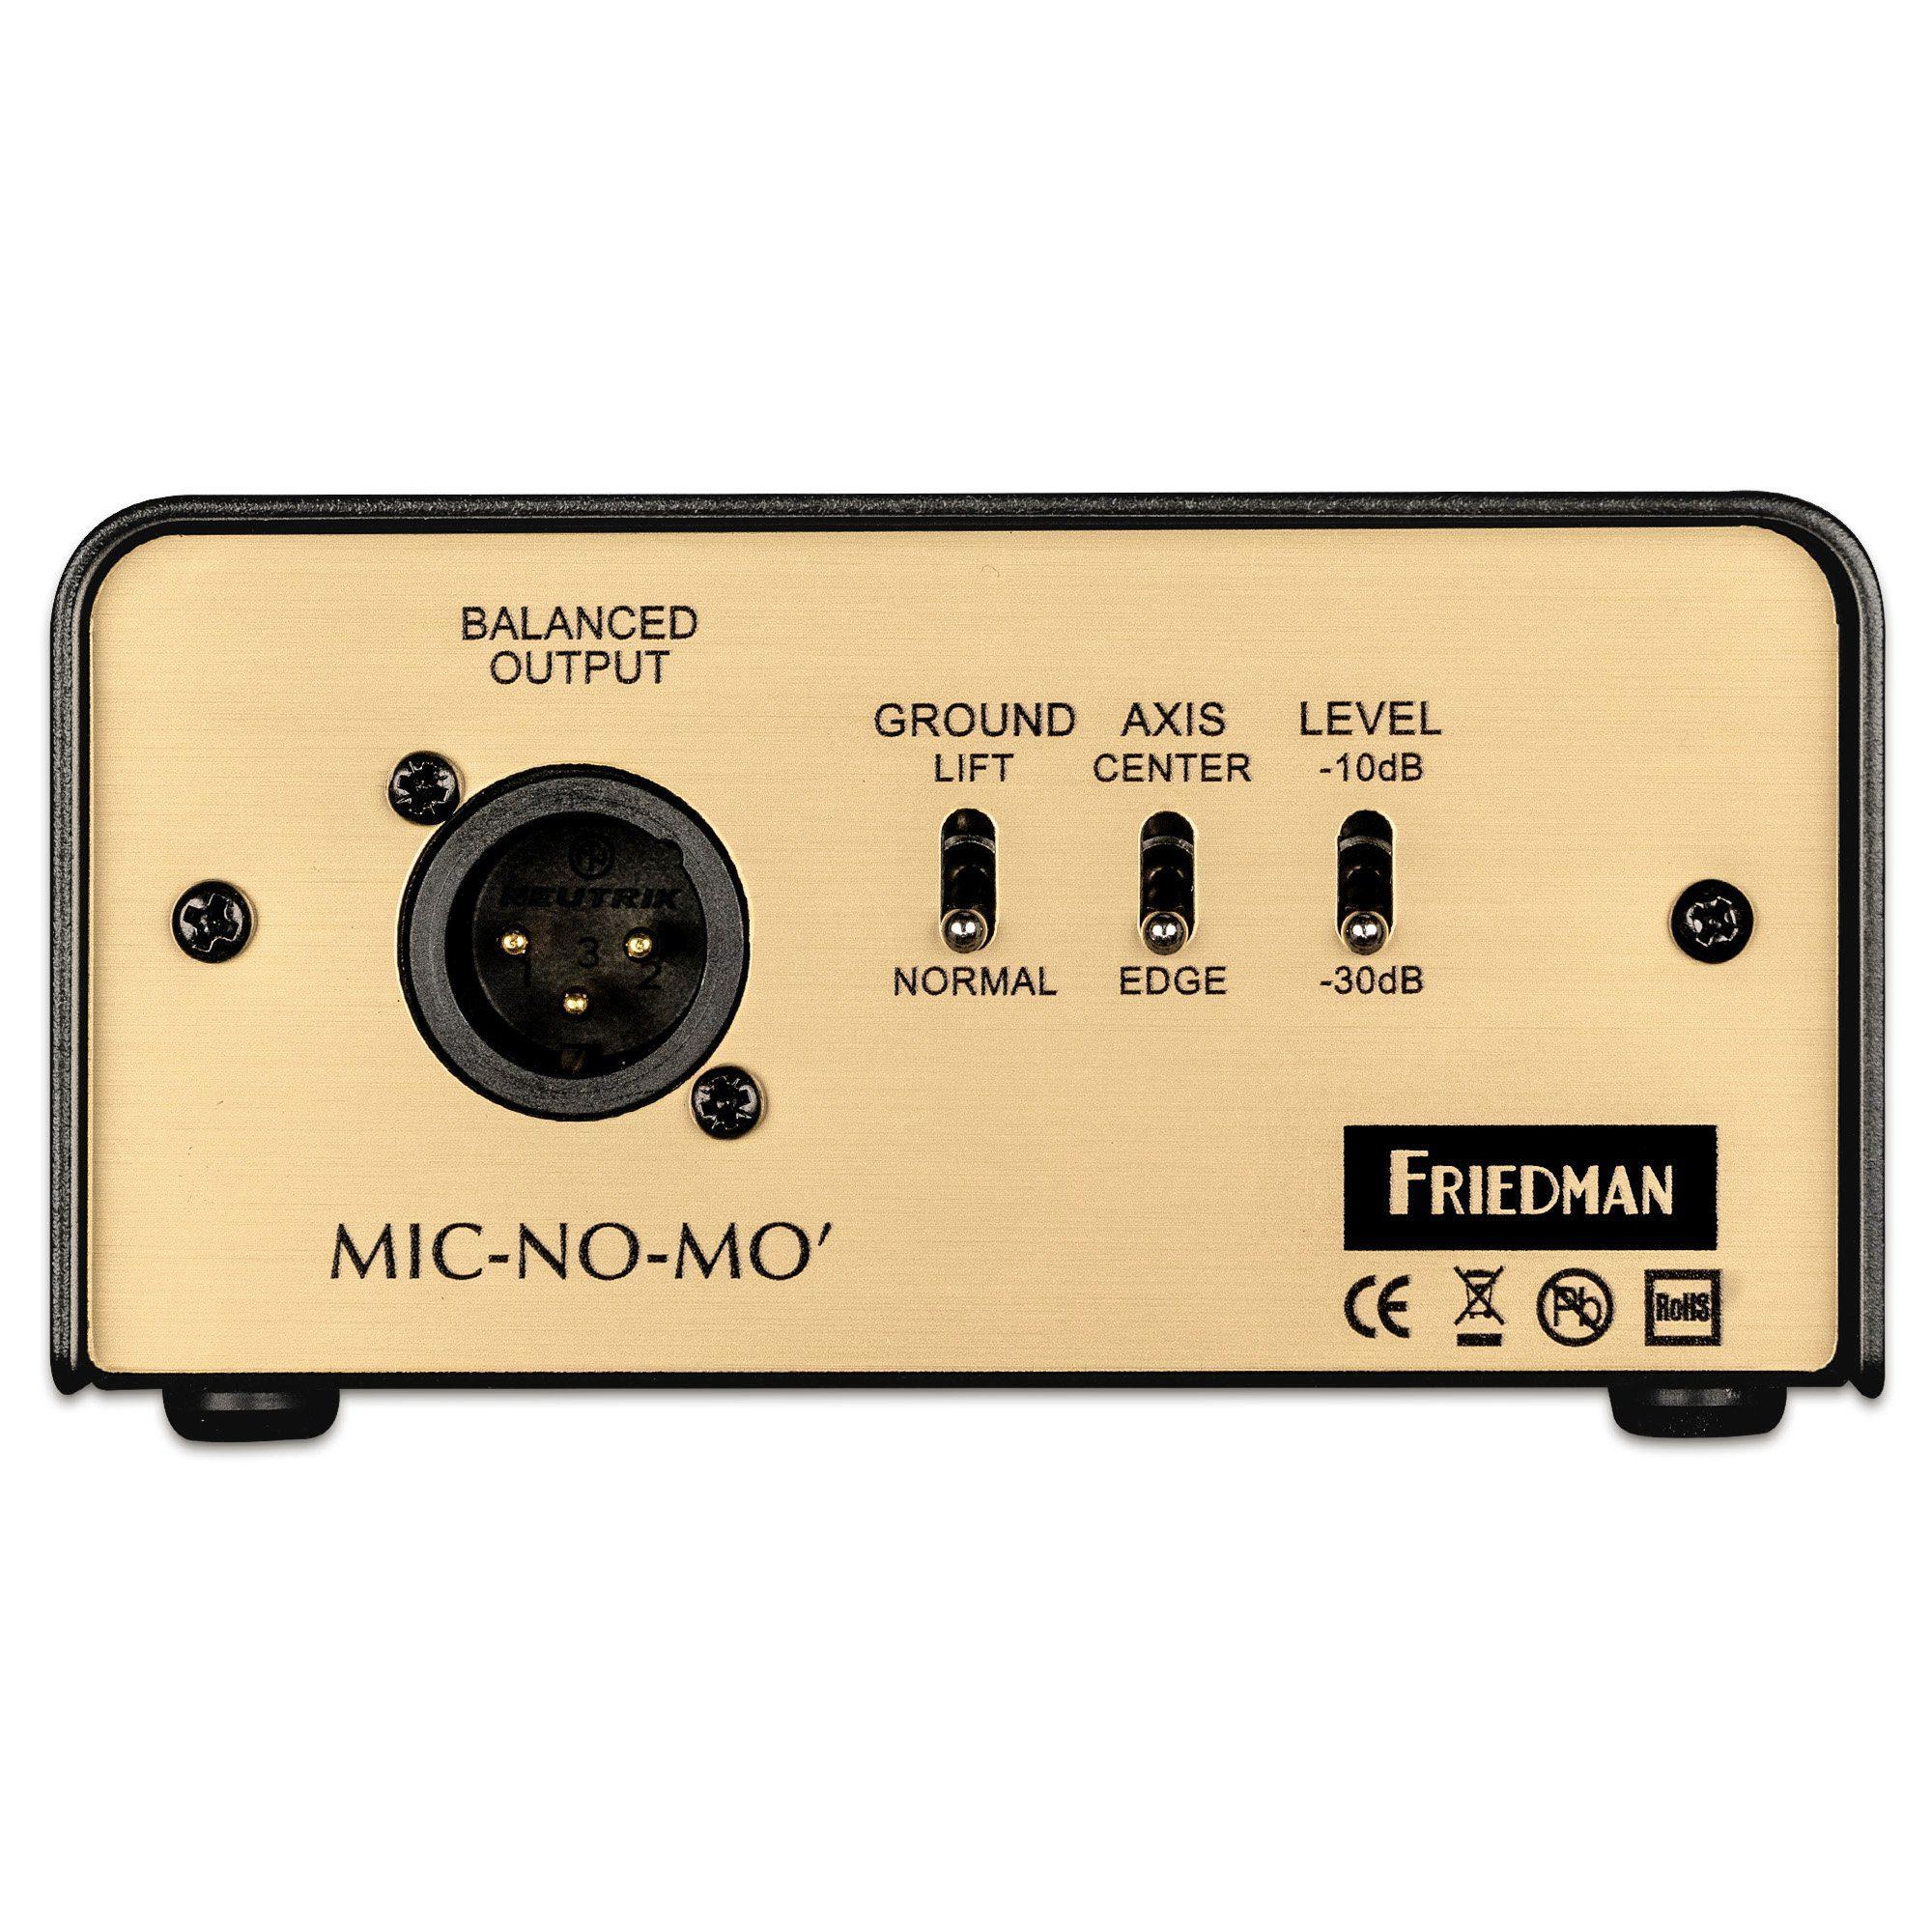 Friedman_Mic-No-Mo_back